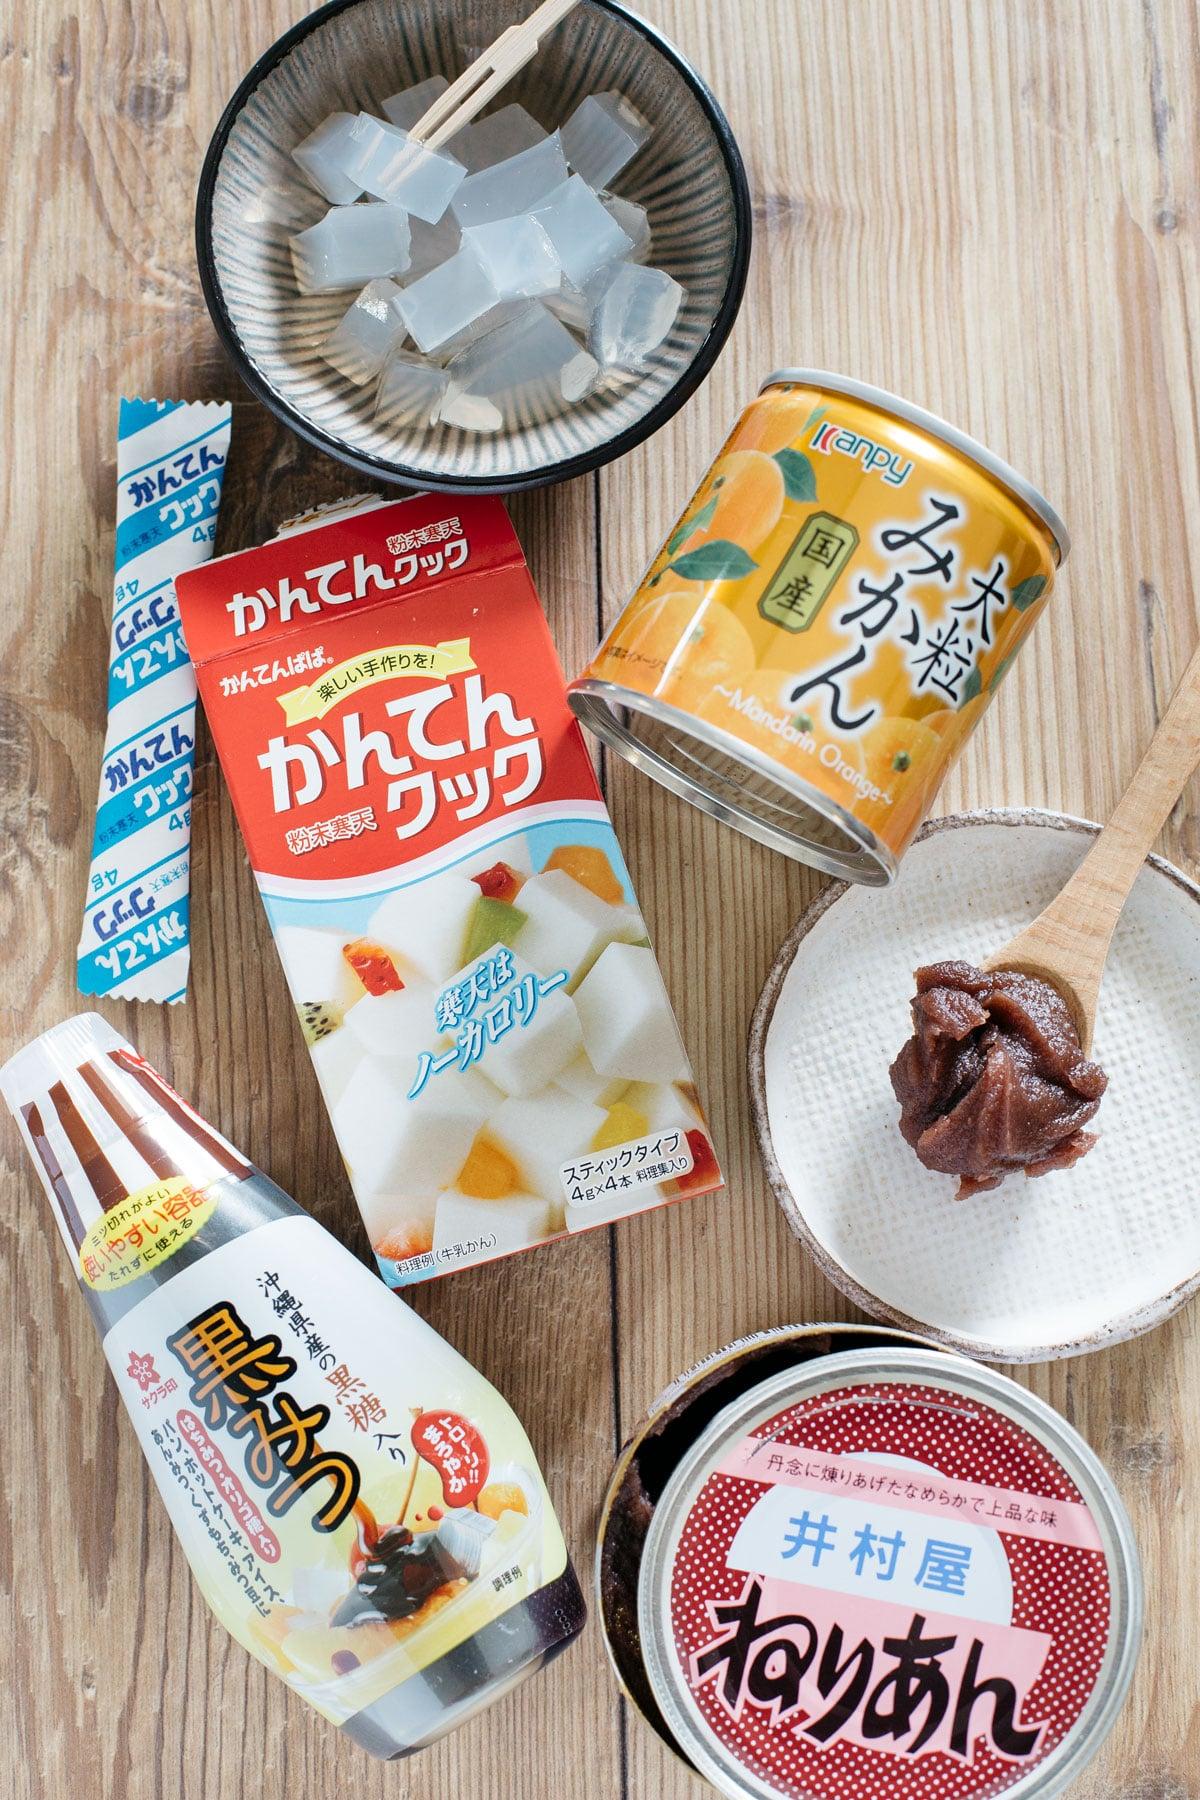 Anmitsu topping ingredients, kanten jelly, azuki bean paste, brown sugar syrup, and caned madarin